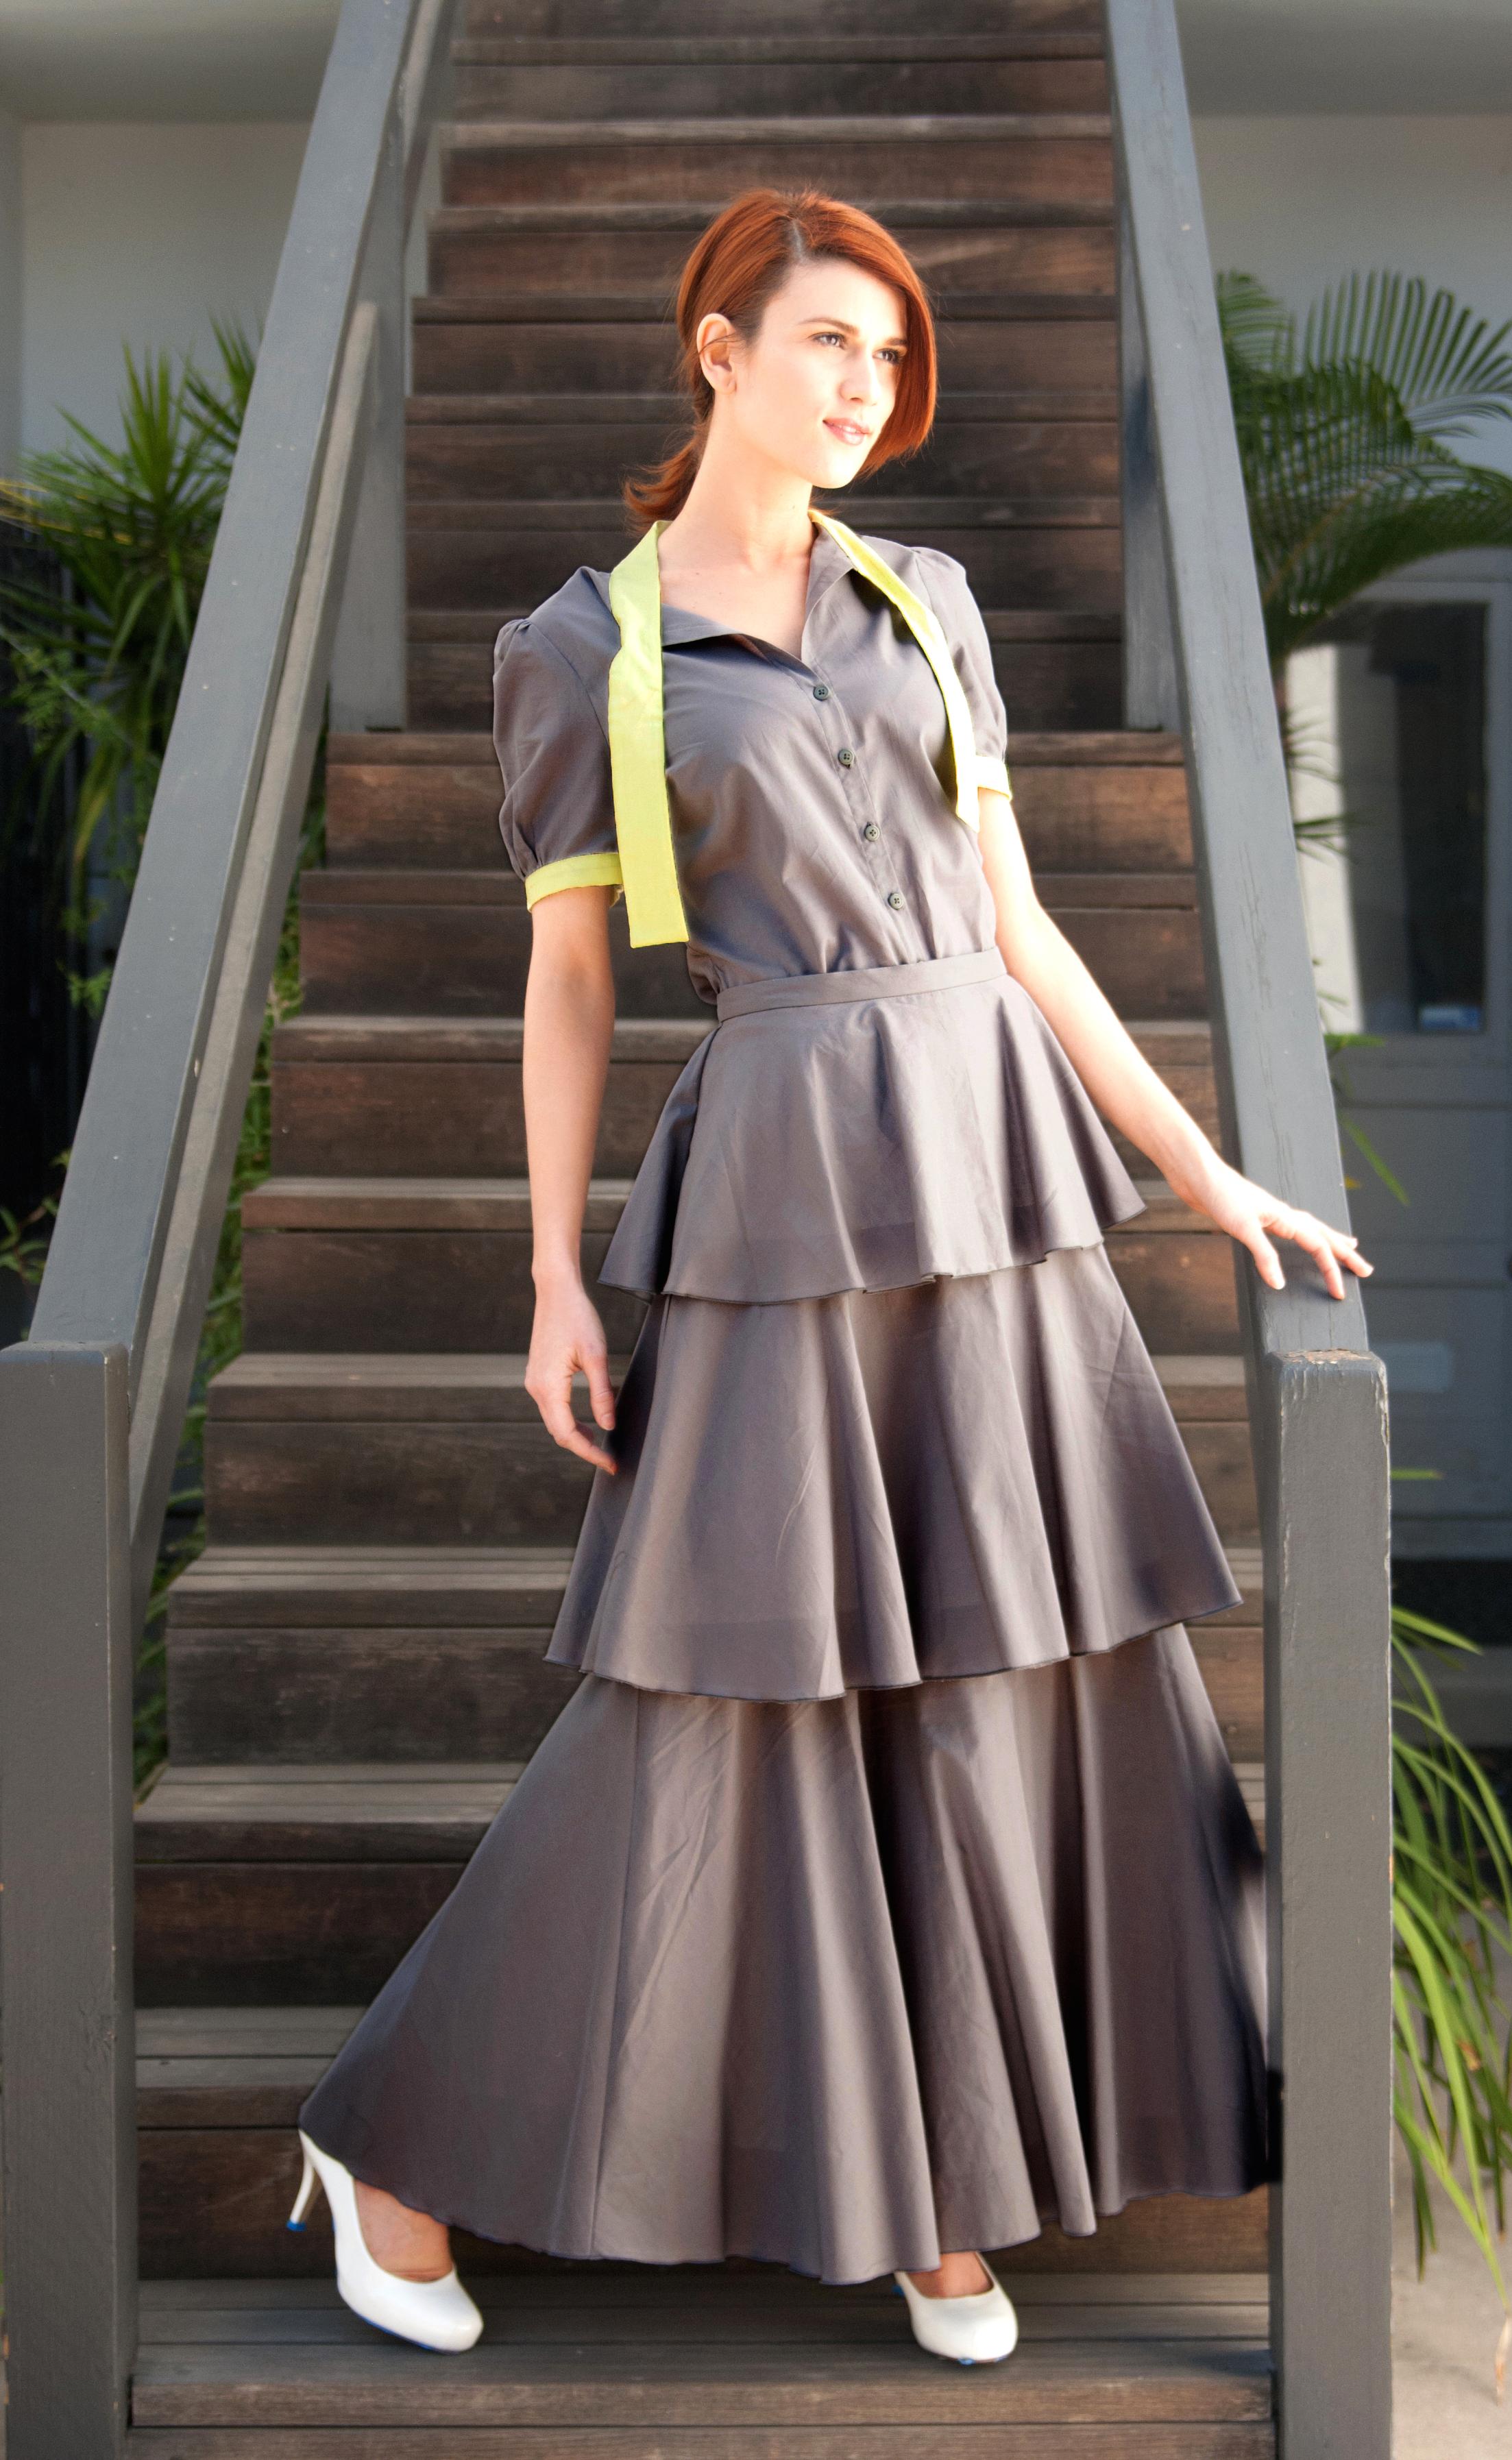 Tie Neck Blouse & 3-Tier Maxi Skirt